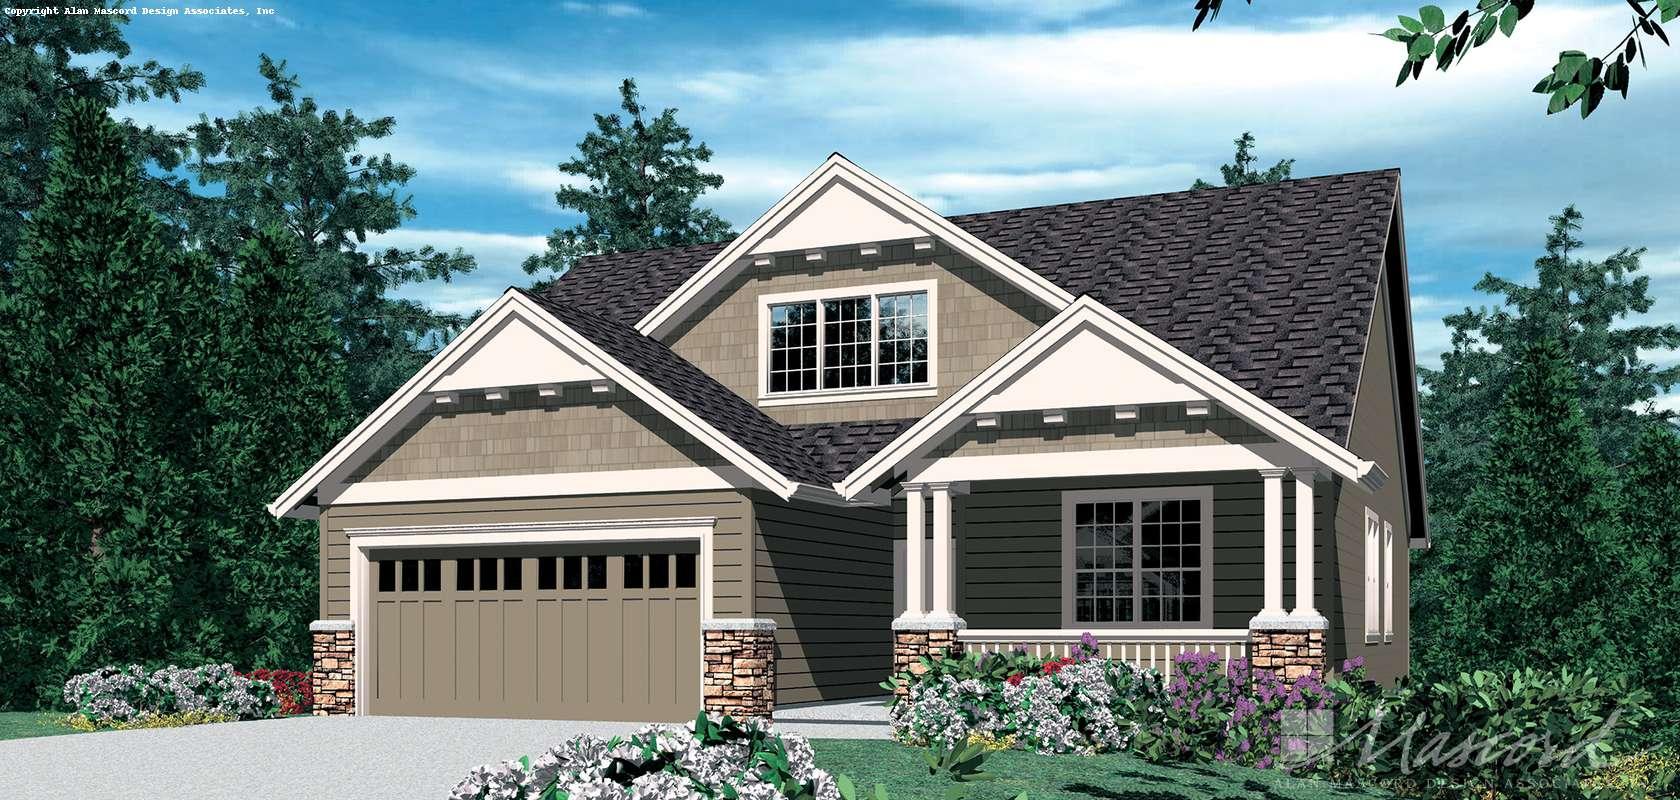 Mascord House Plan 2185A: The Chandler